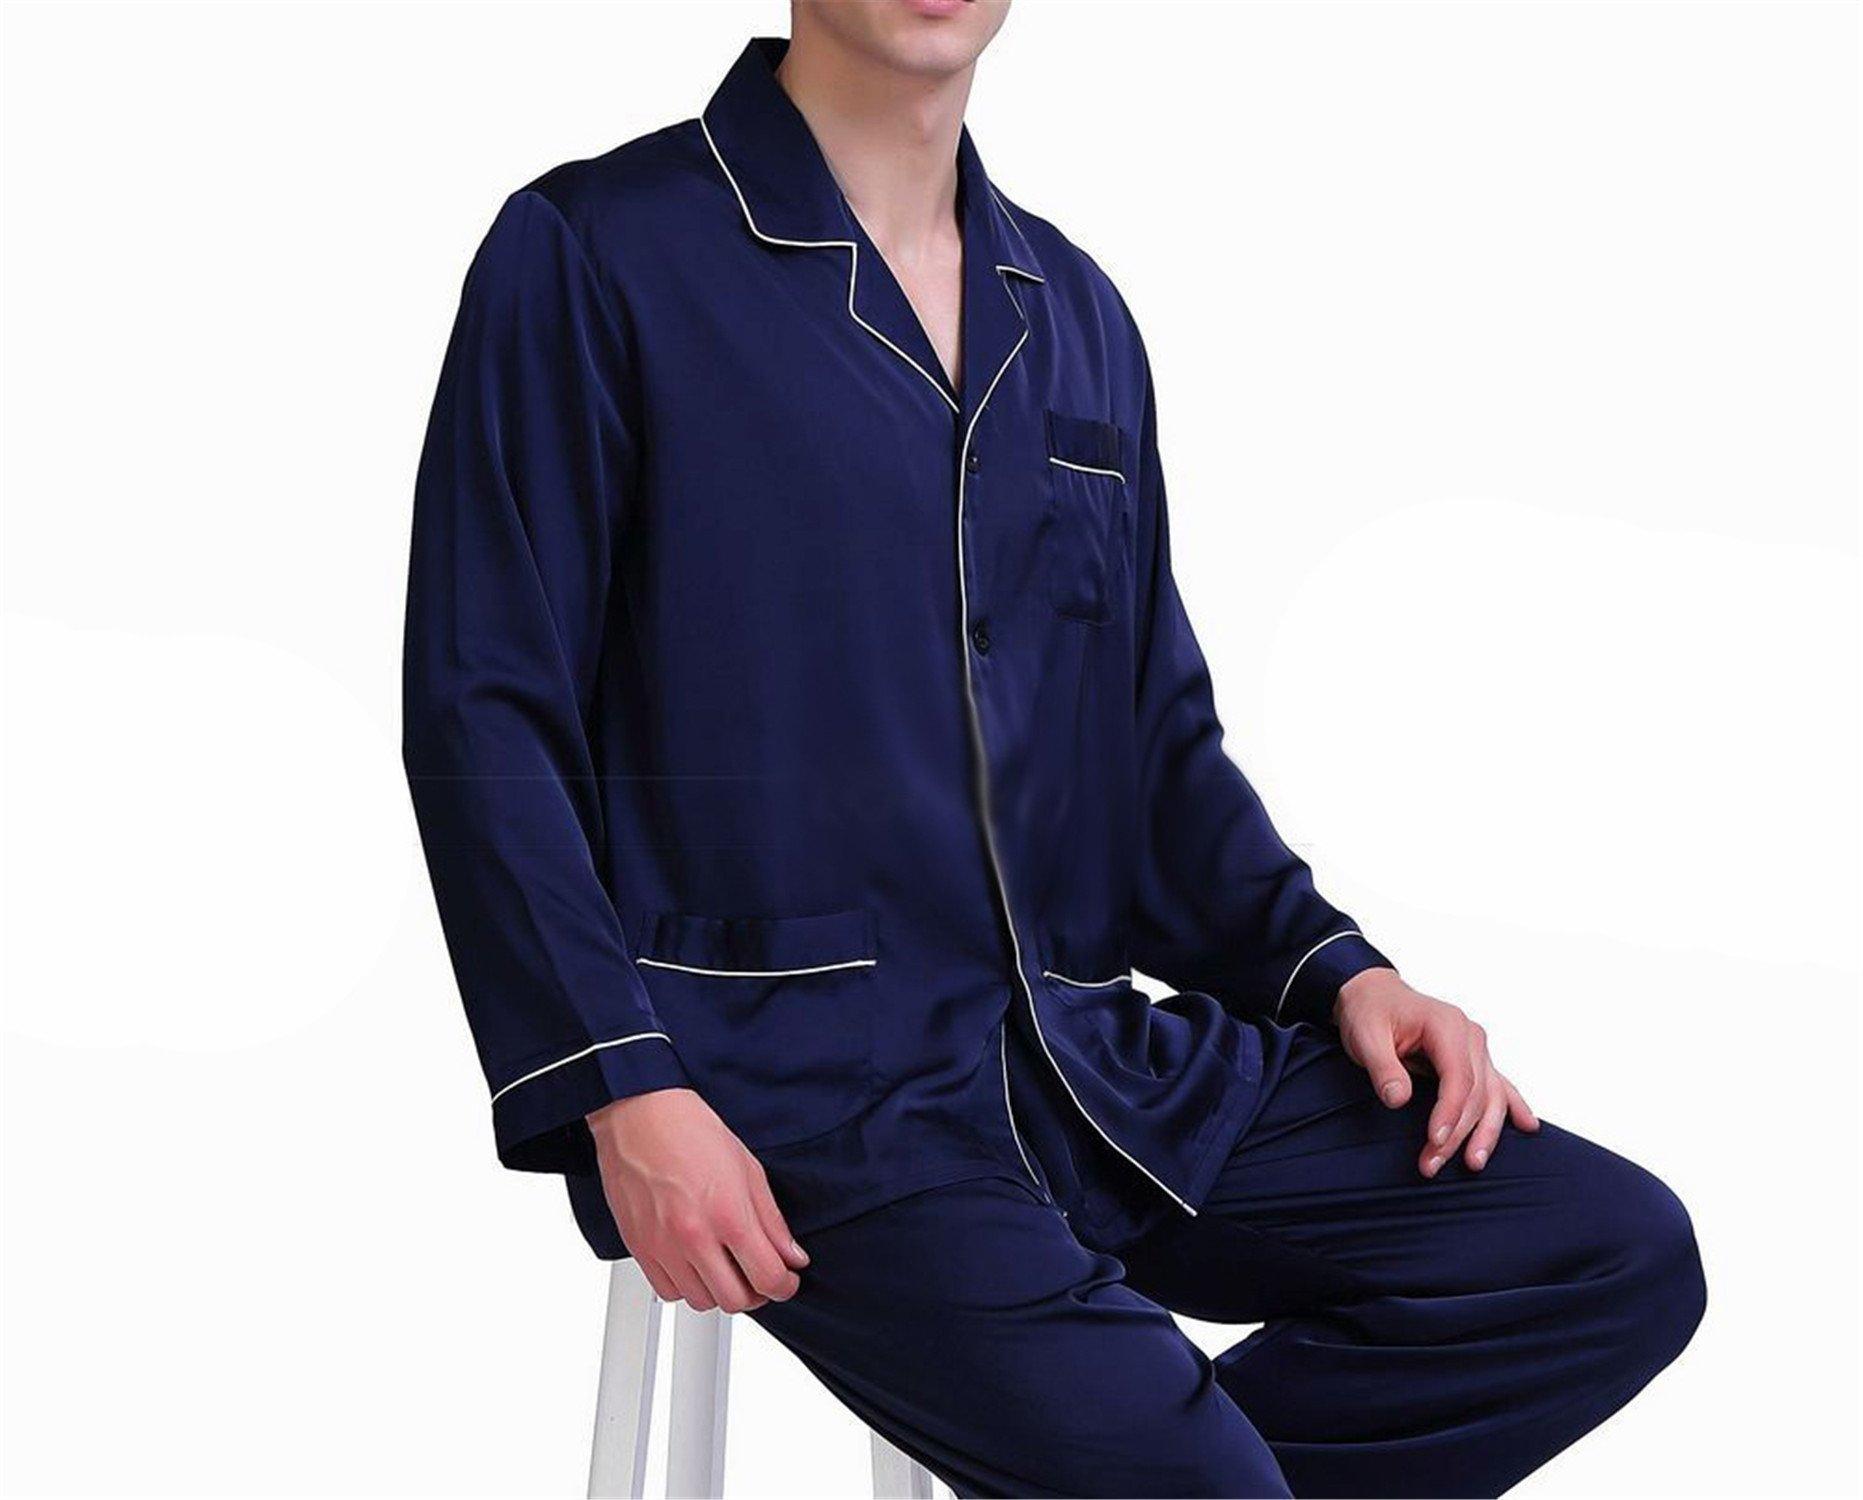 Susan1999 Mens Silk Satin Pajamas Set Sleepwear Loungewear S M L XL XXL XXXL 4XL Fits All Seasons Navy Blue XXXL